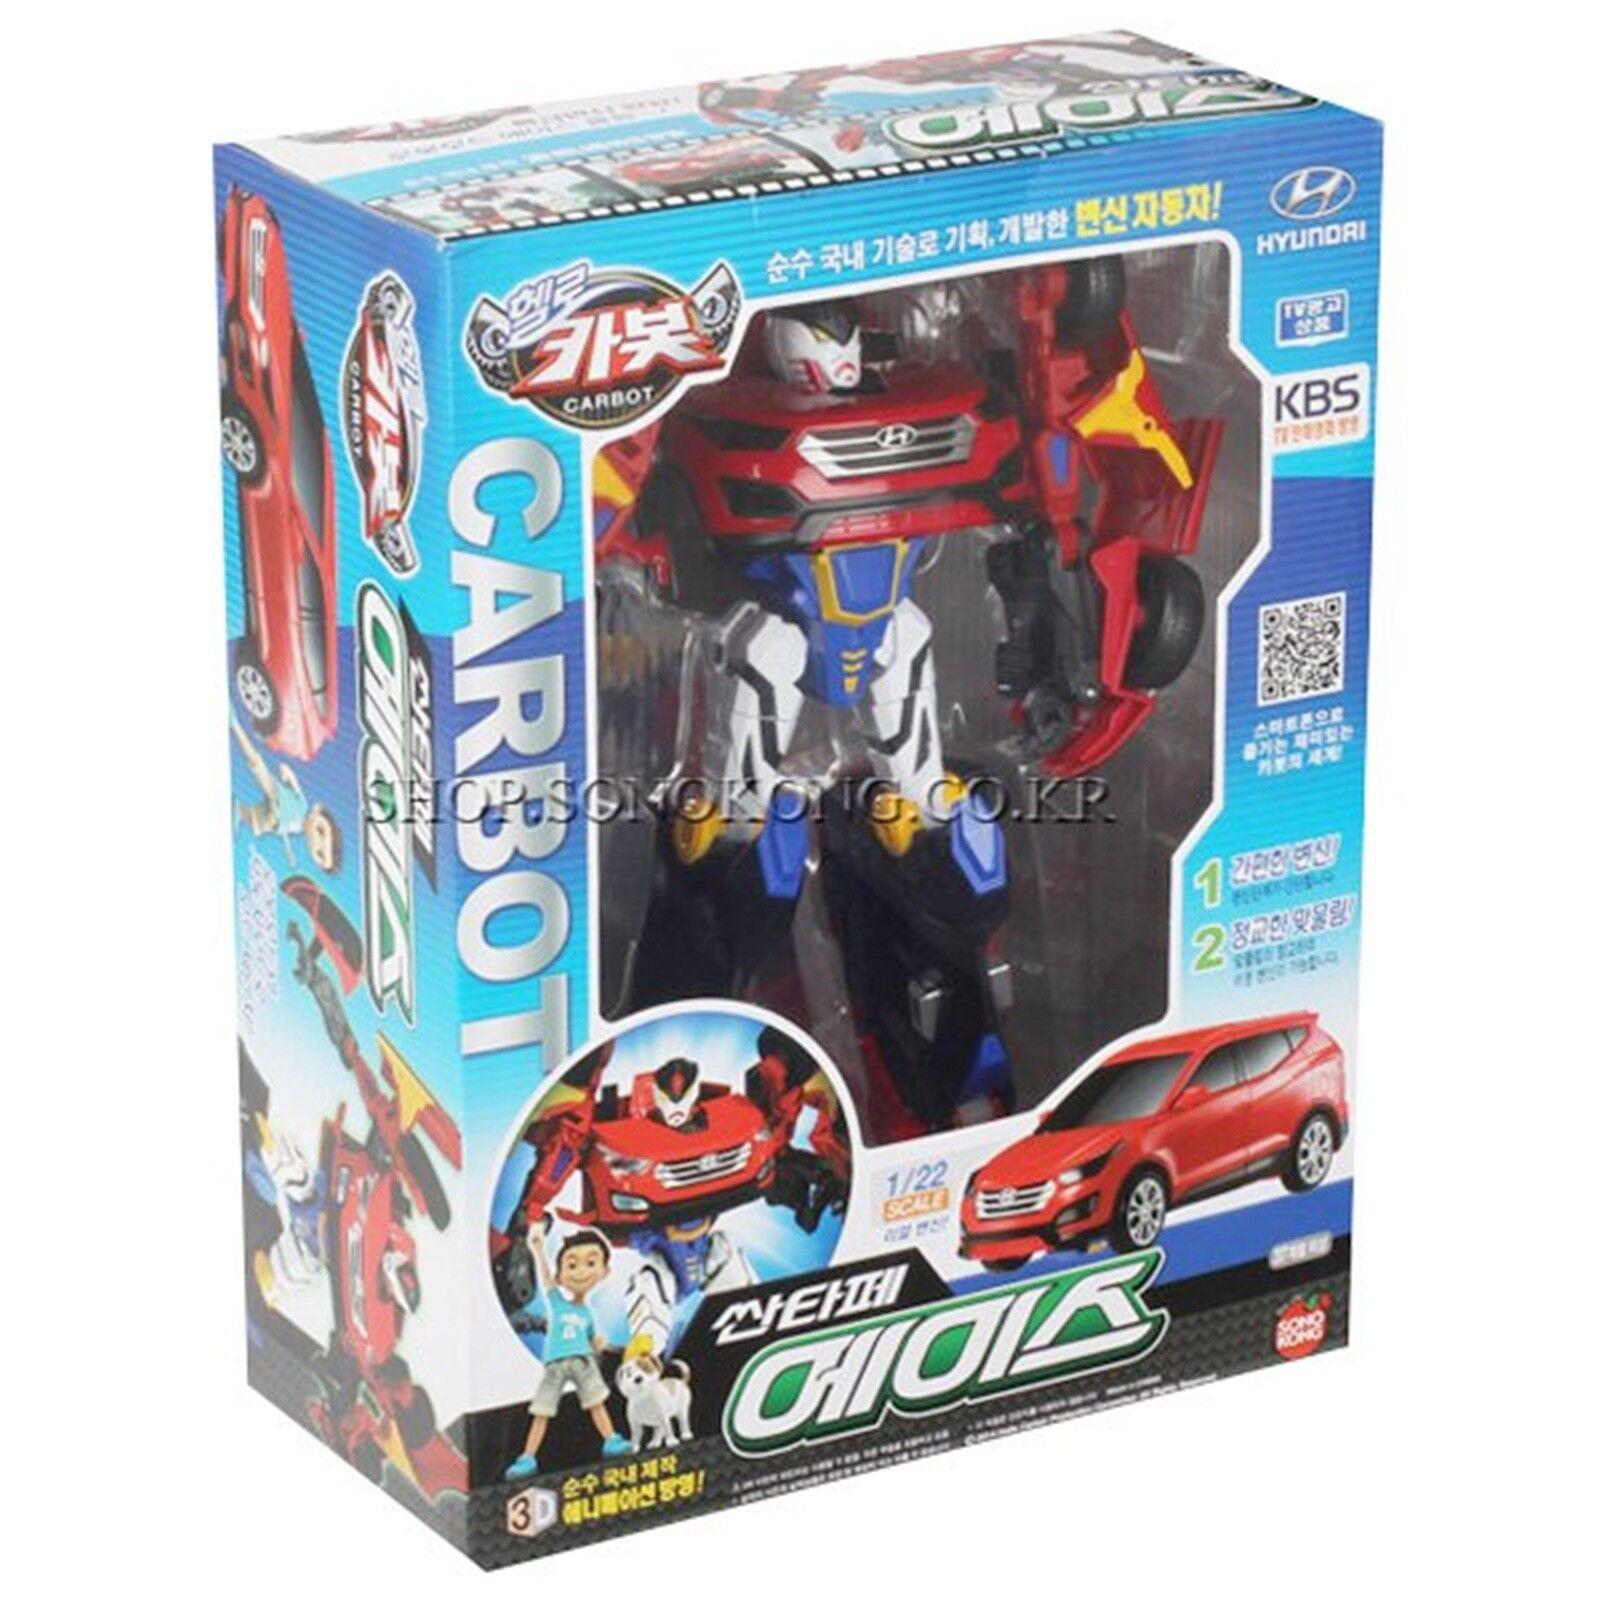 Hej bilbot 1  23 skala Hyundai SANTAFE ACE röd Transformer Robot bil leksak